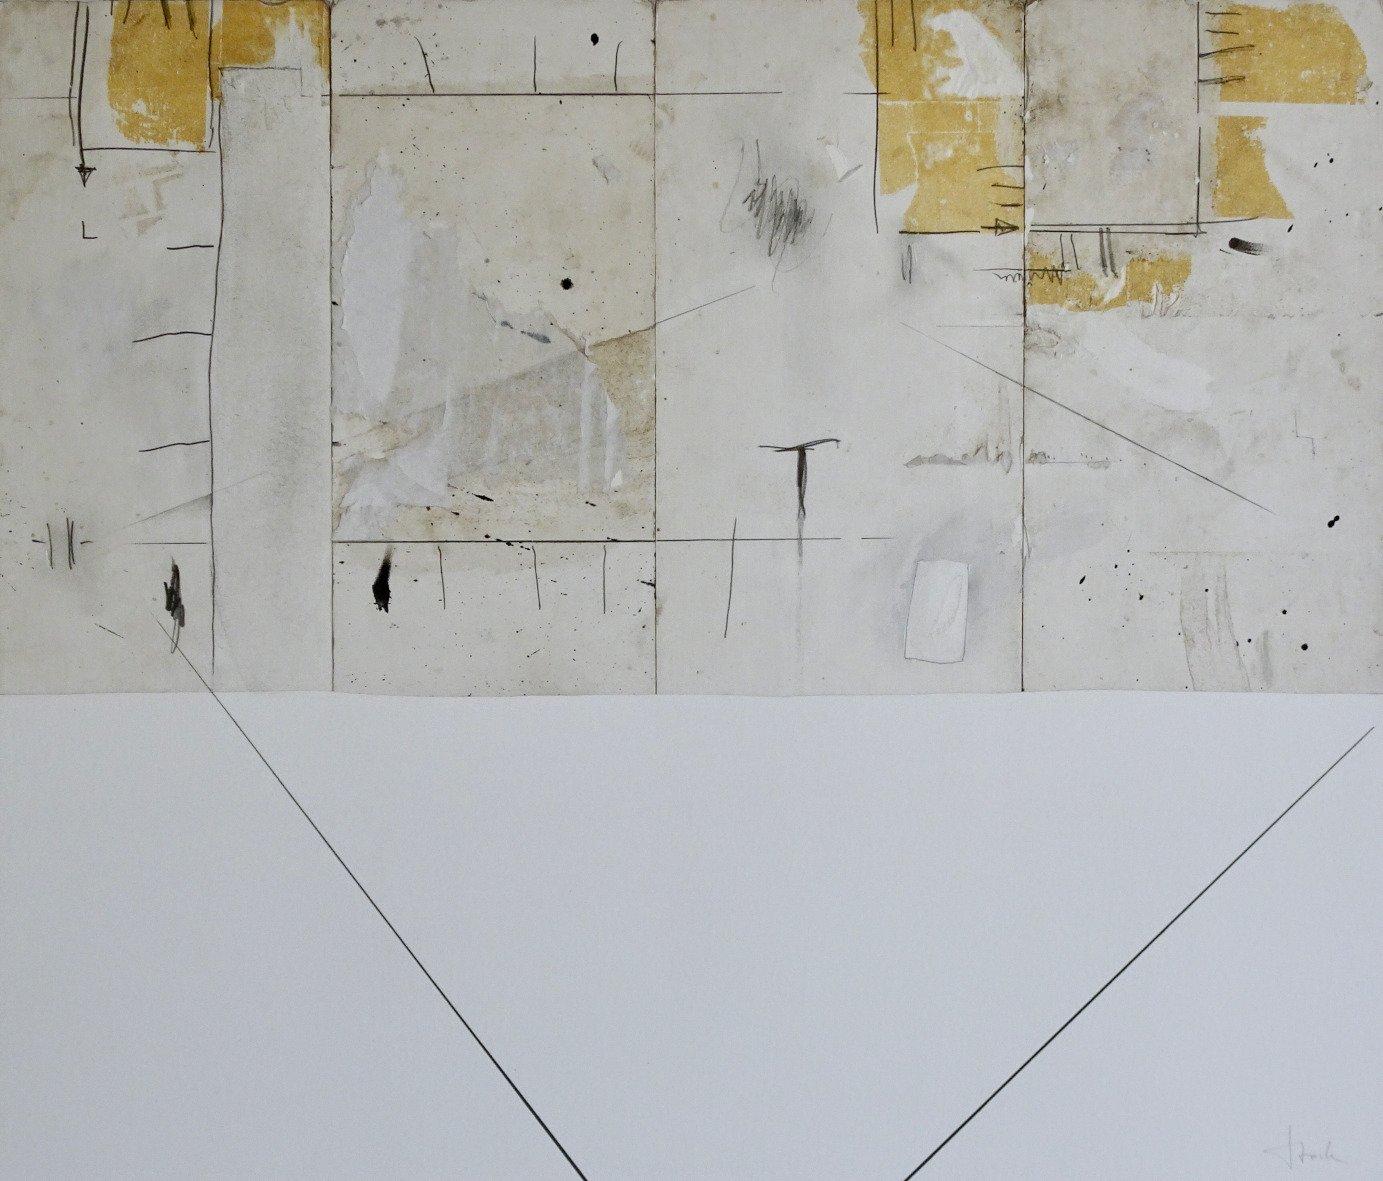 Rainer Storck | Ohne Titel | Acryl auf Papier | 59 x 69 cm | 2019